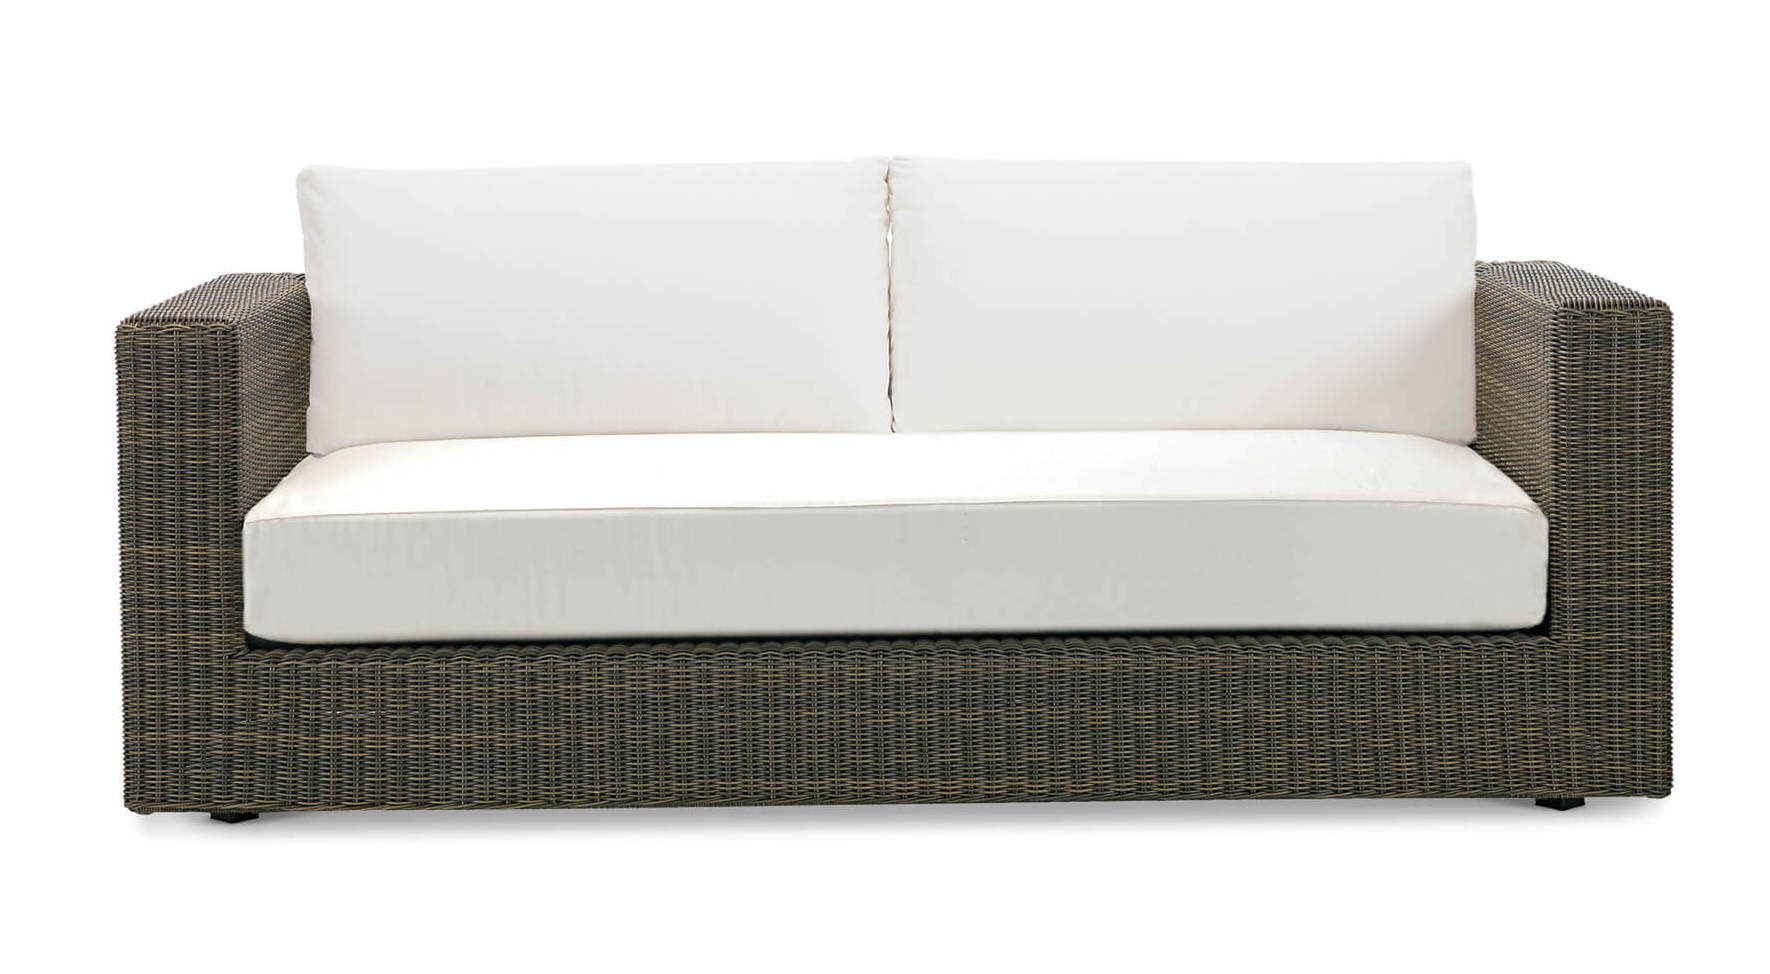 Ethimo Cube 3 Sitzer Lounge Sofa Kaufen Bei Villa Schmidt Gmbh